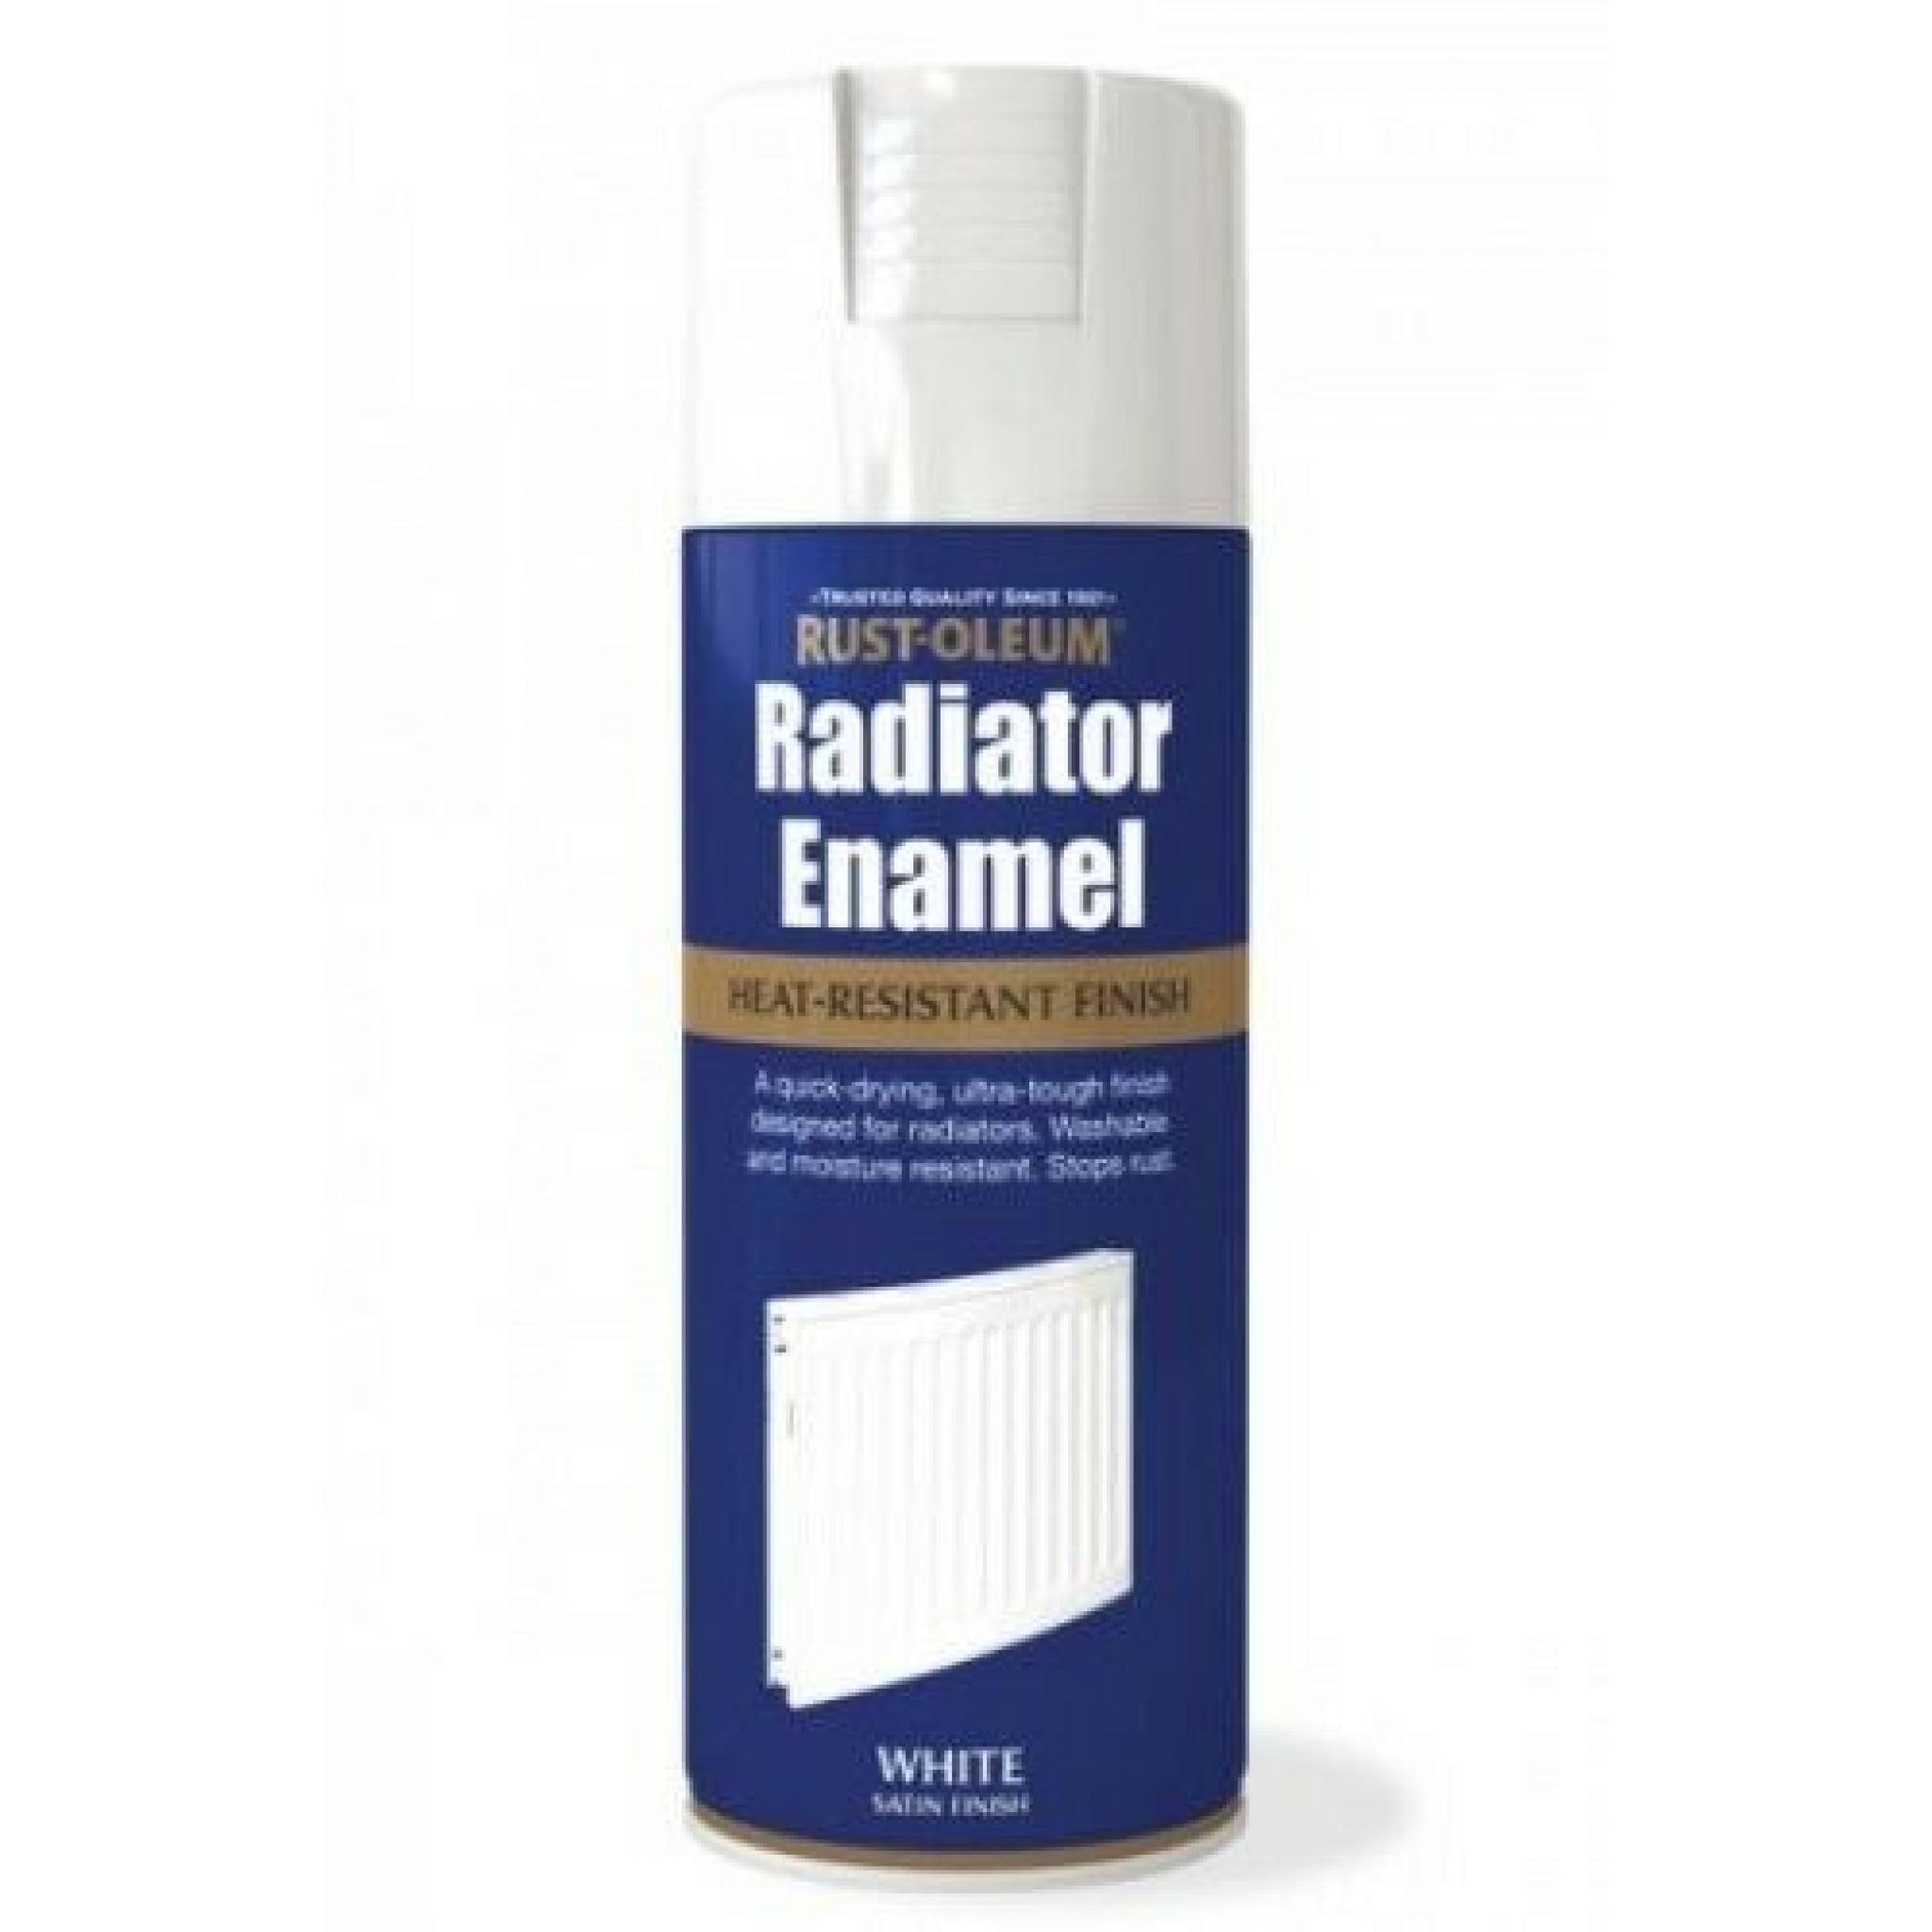 Radiator Enamel White Satin Rust Oleum Fast Dry Spray Paint Aerosol 400ml